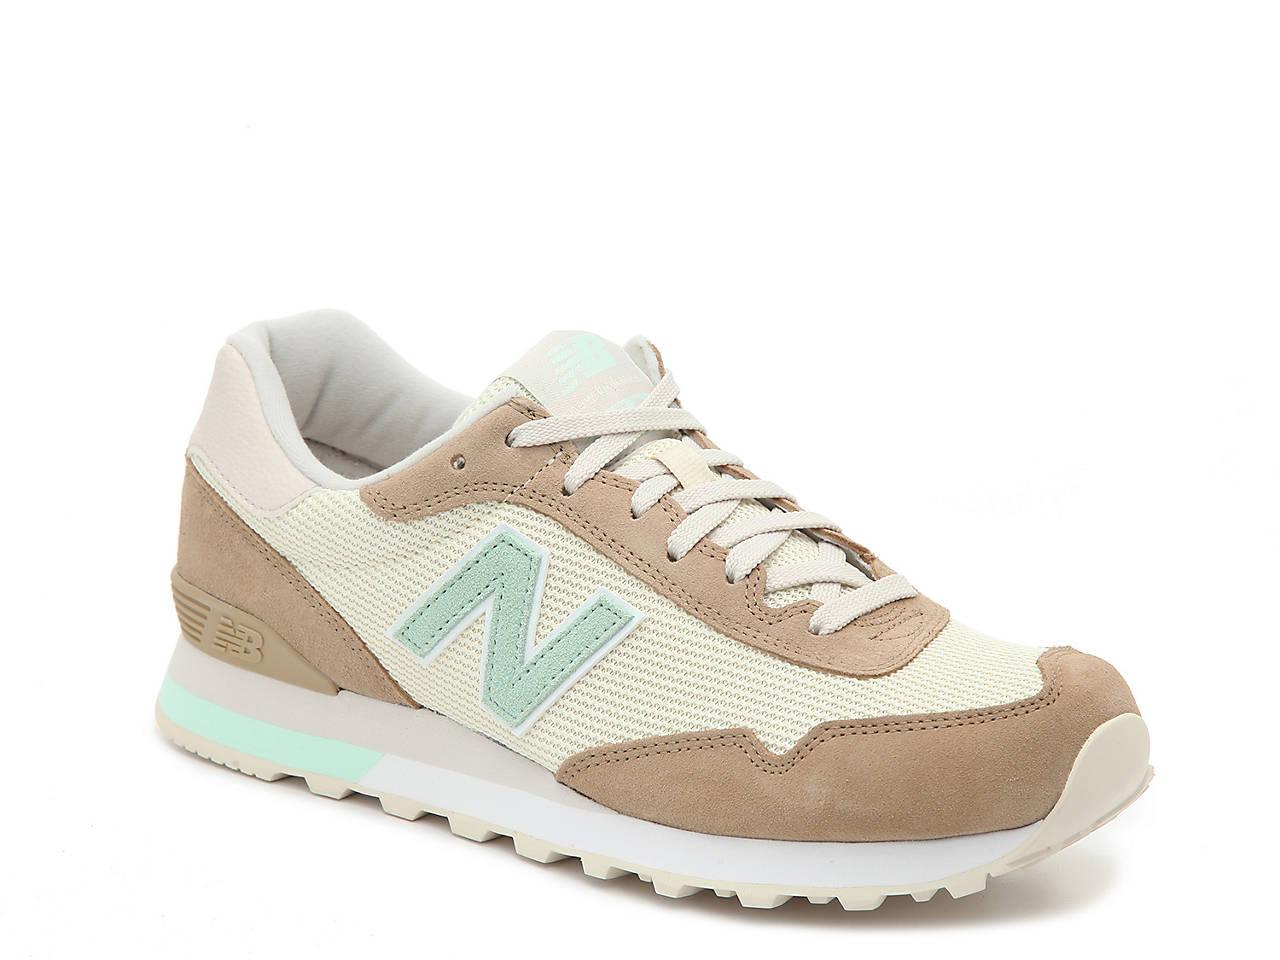 New Balance 515 beige